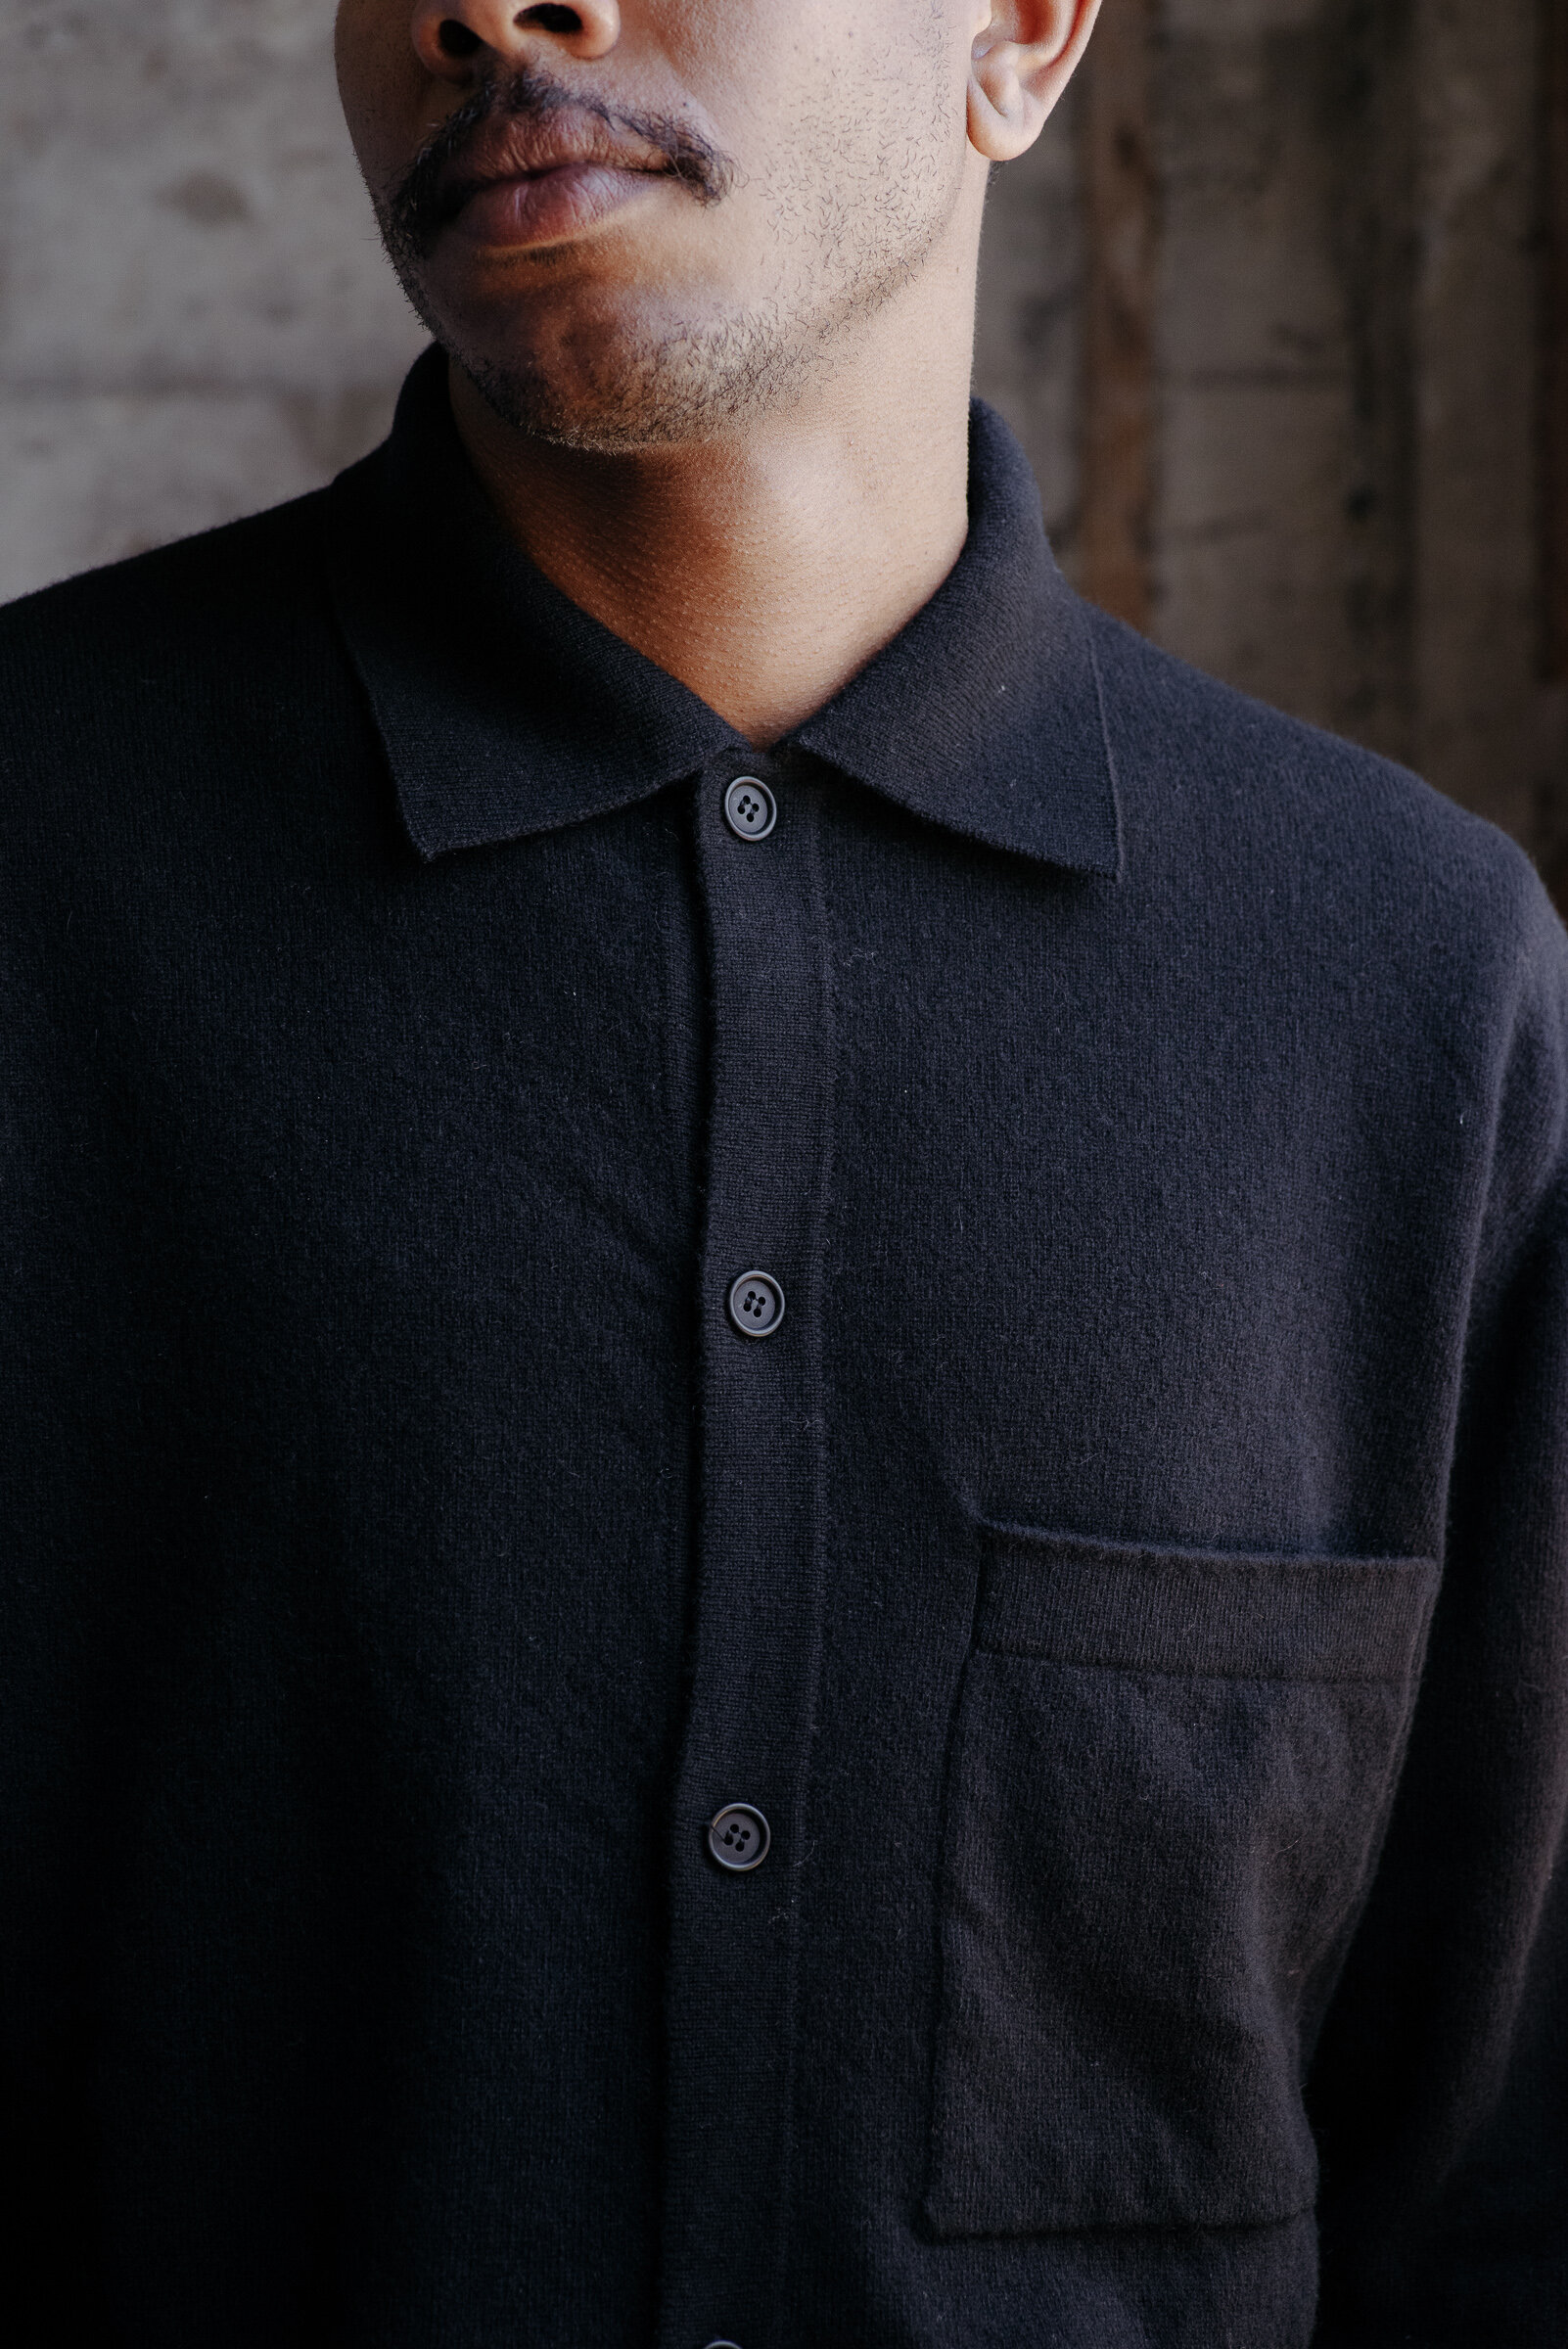 evan-kinori-knit-shirt-cashmere-lambswool-made-in-italy-9